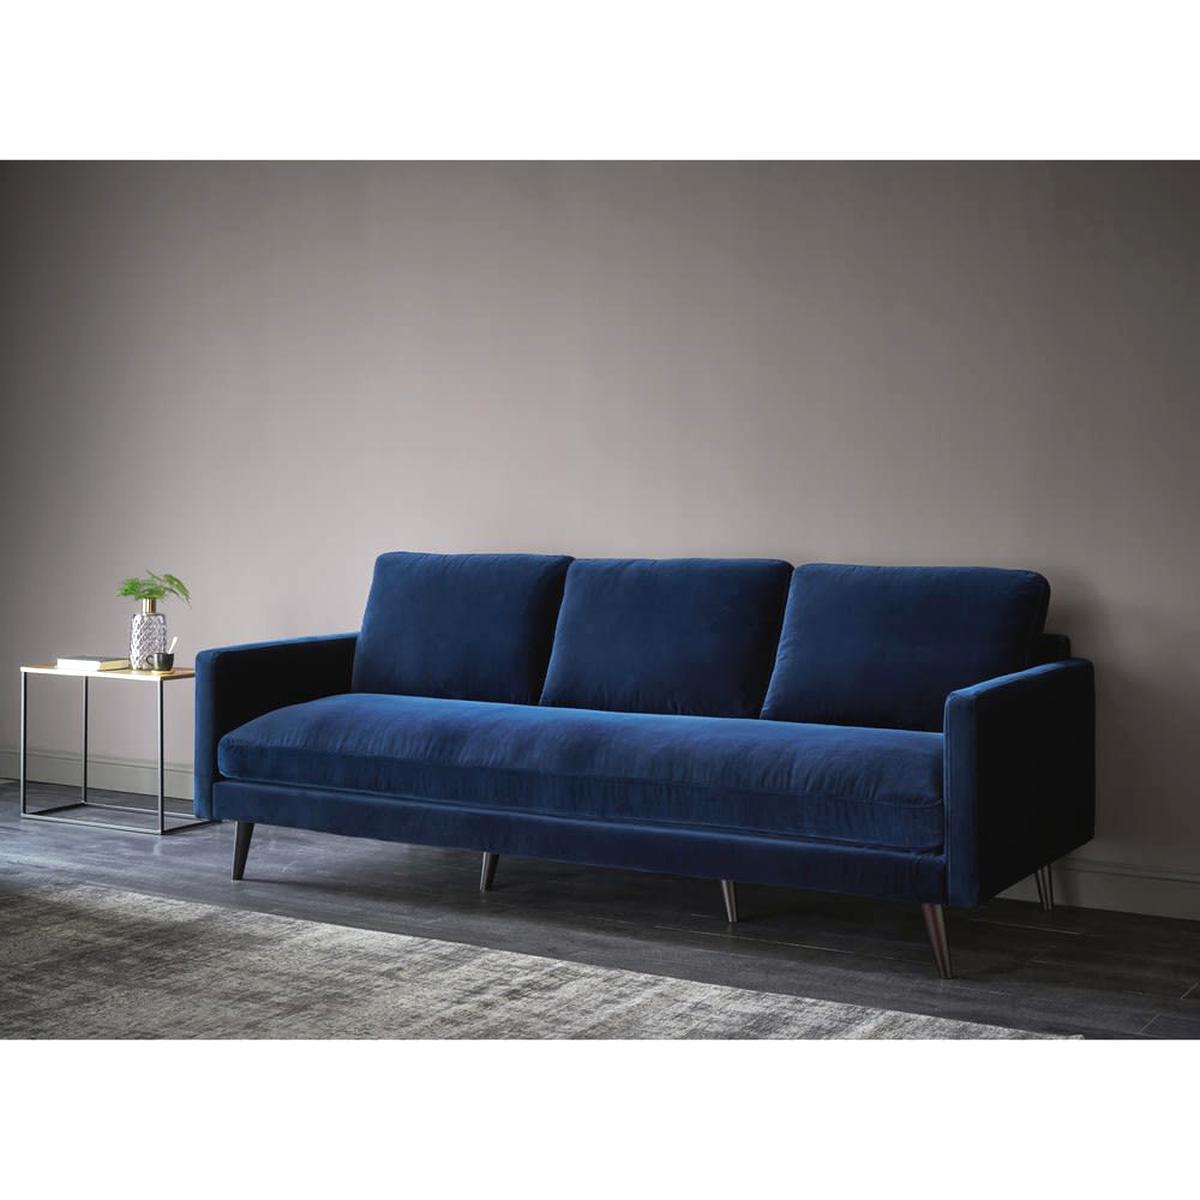 Canape Velours Bleu